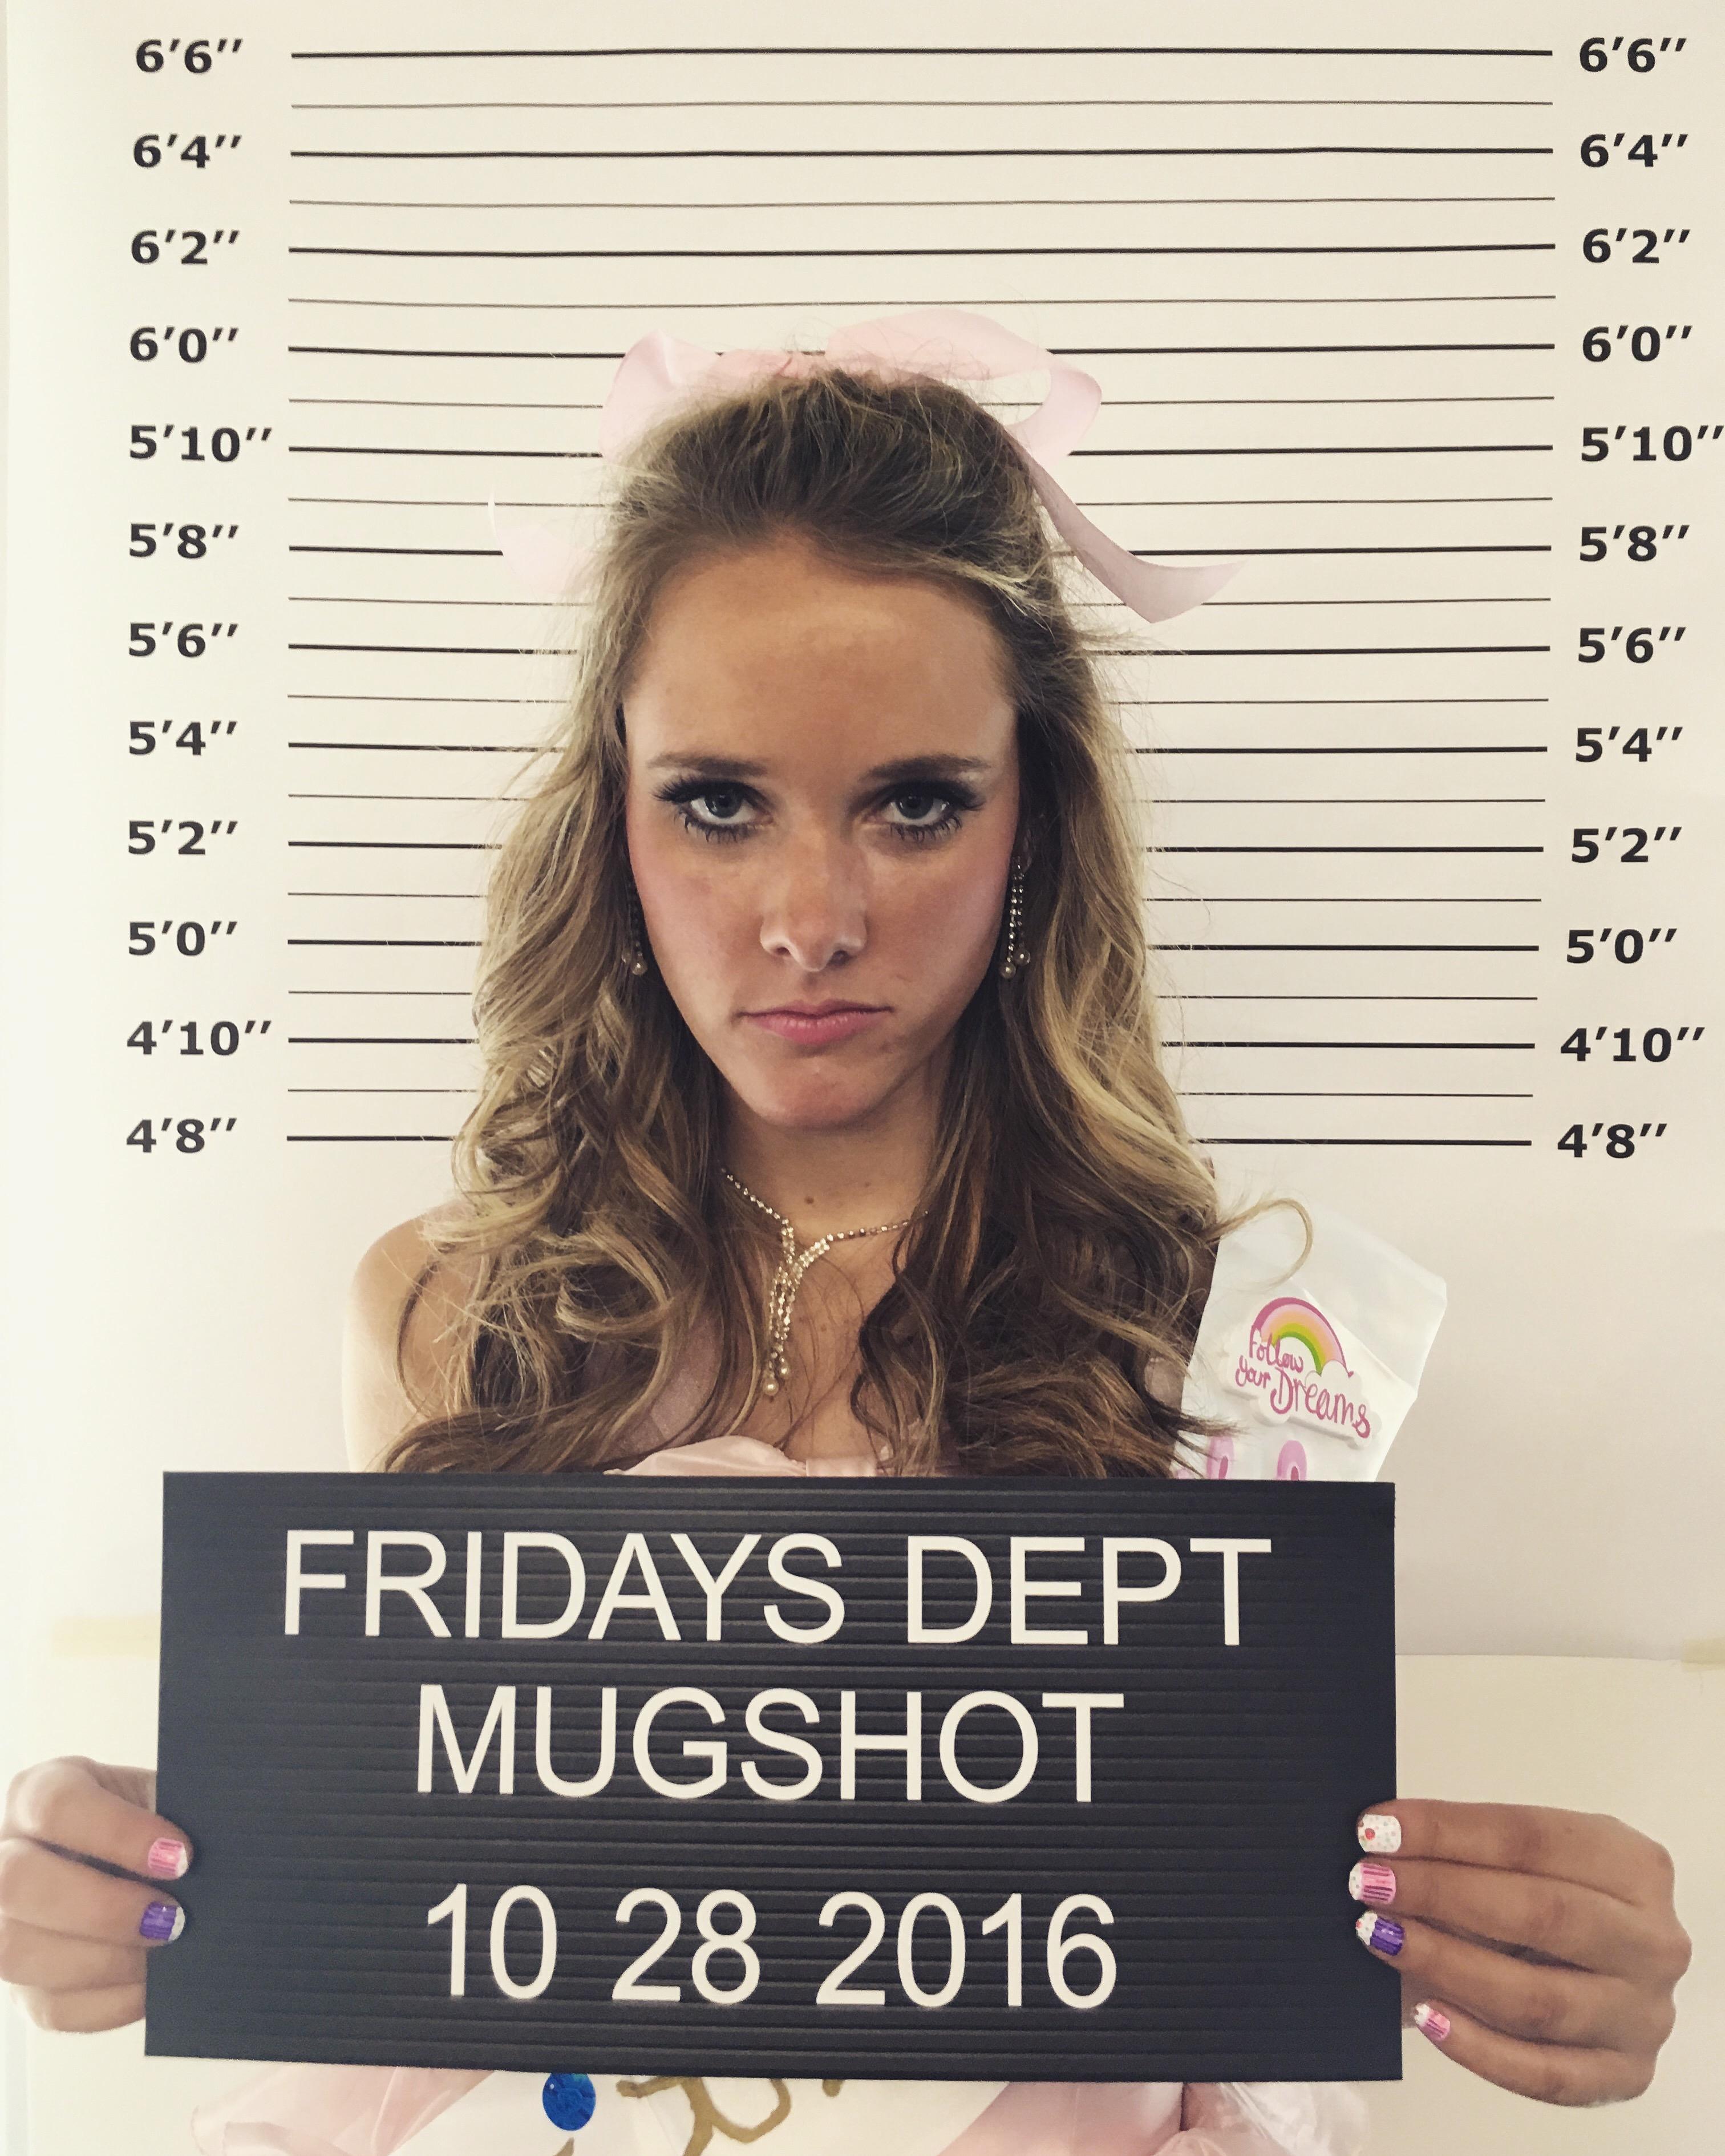 Fridays Mugshot